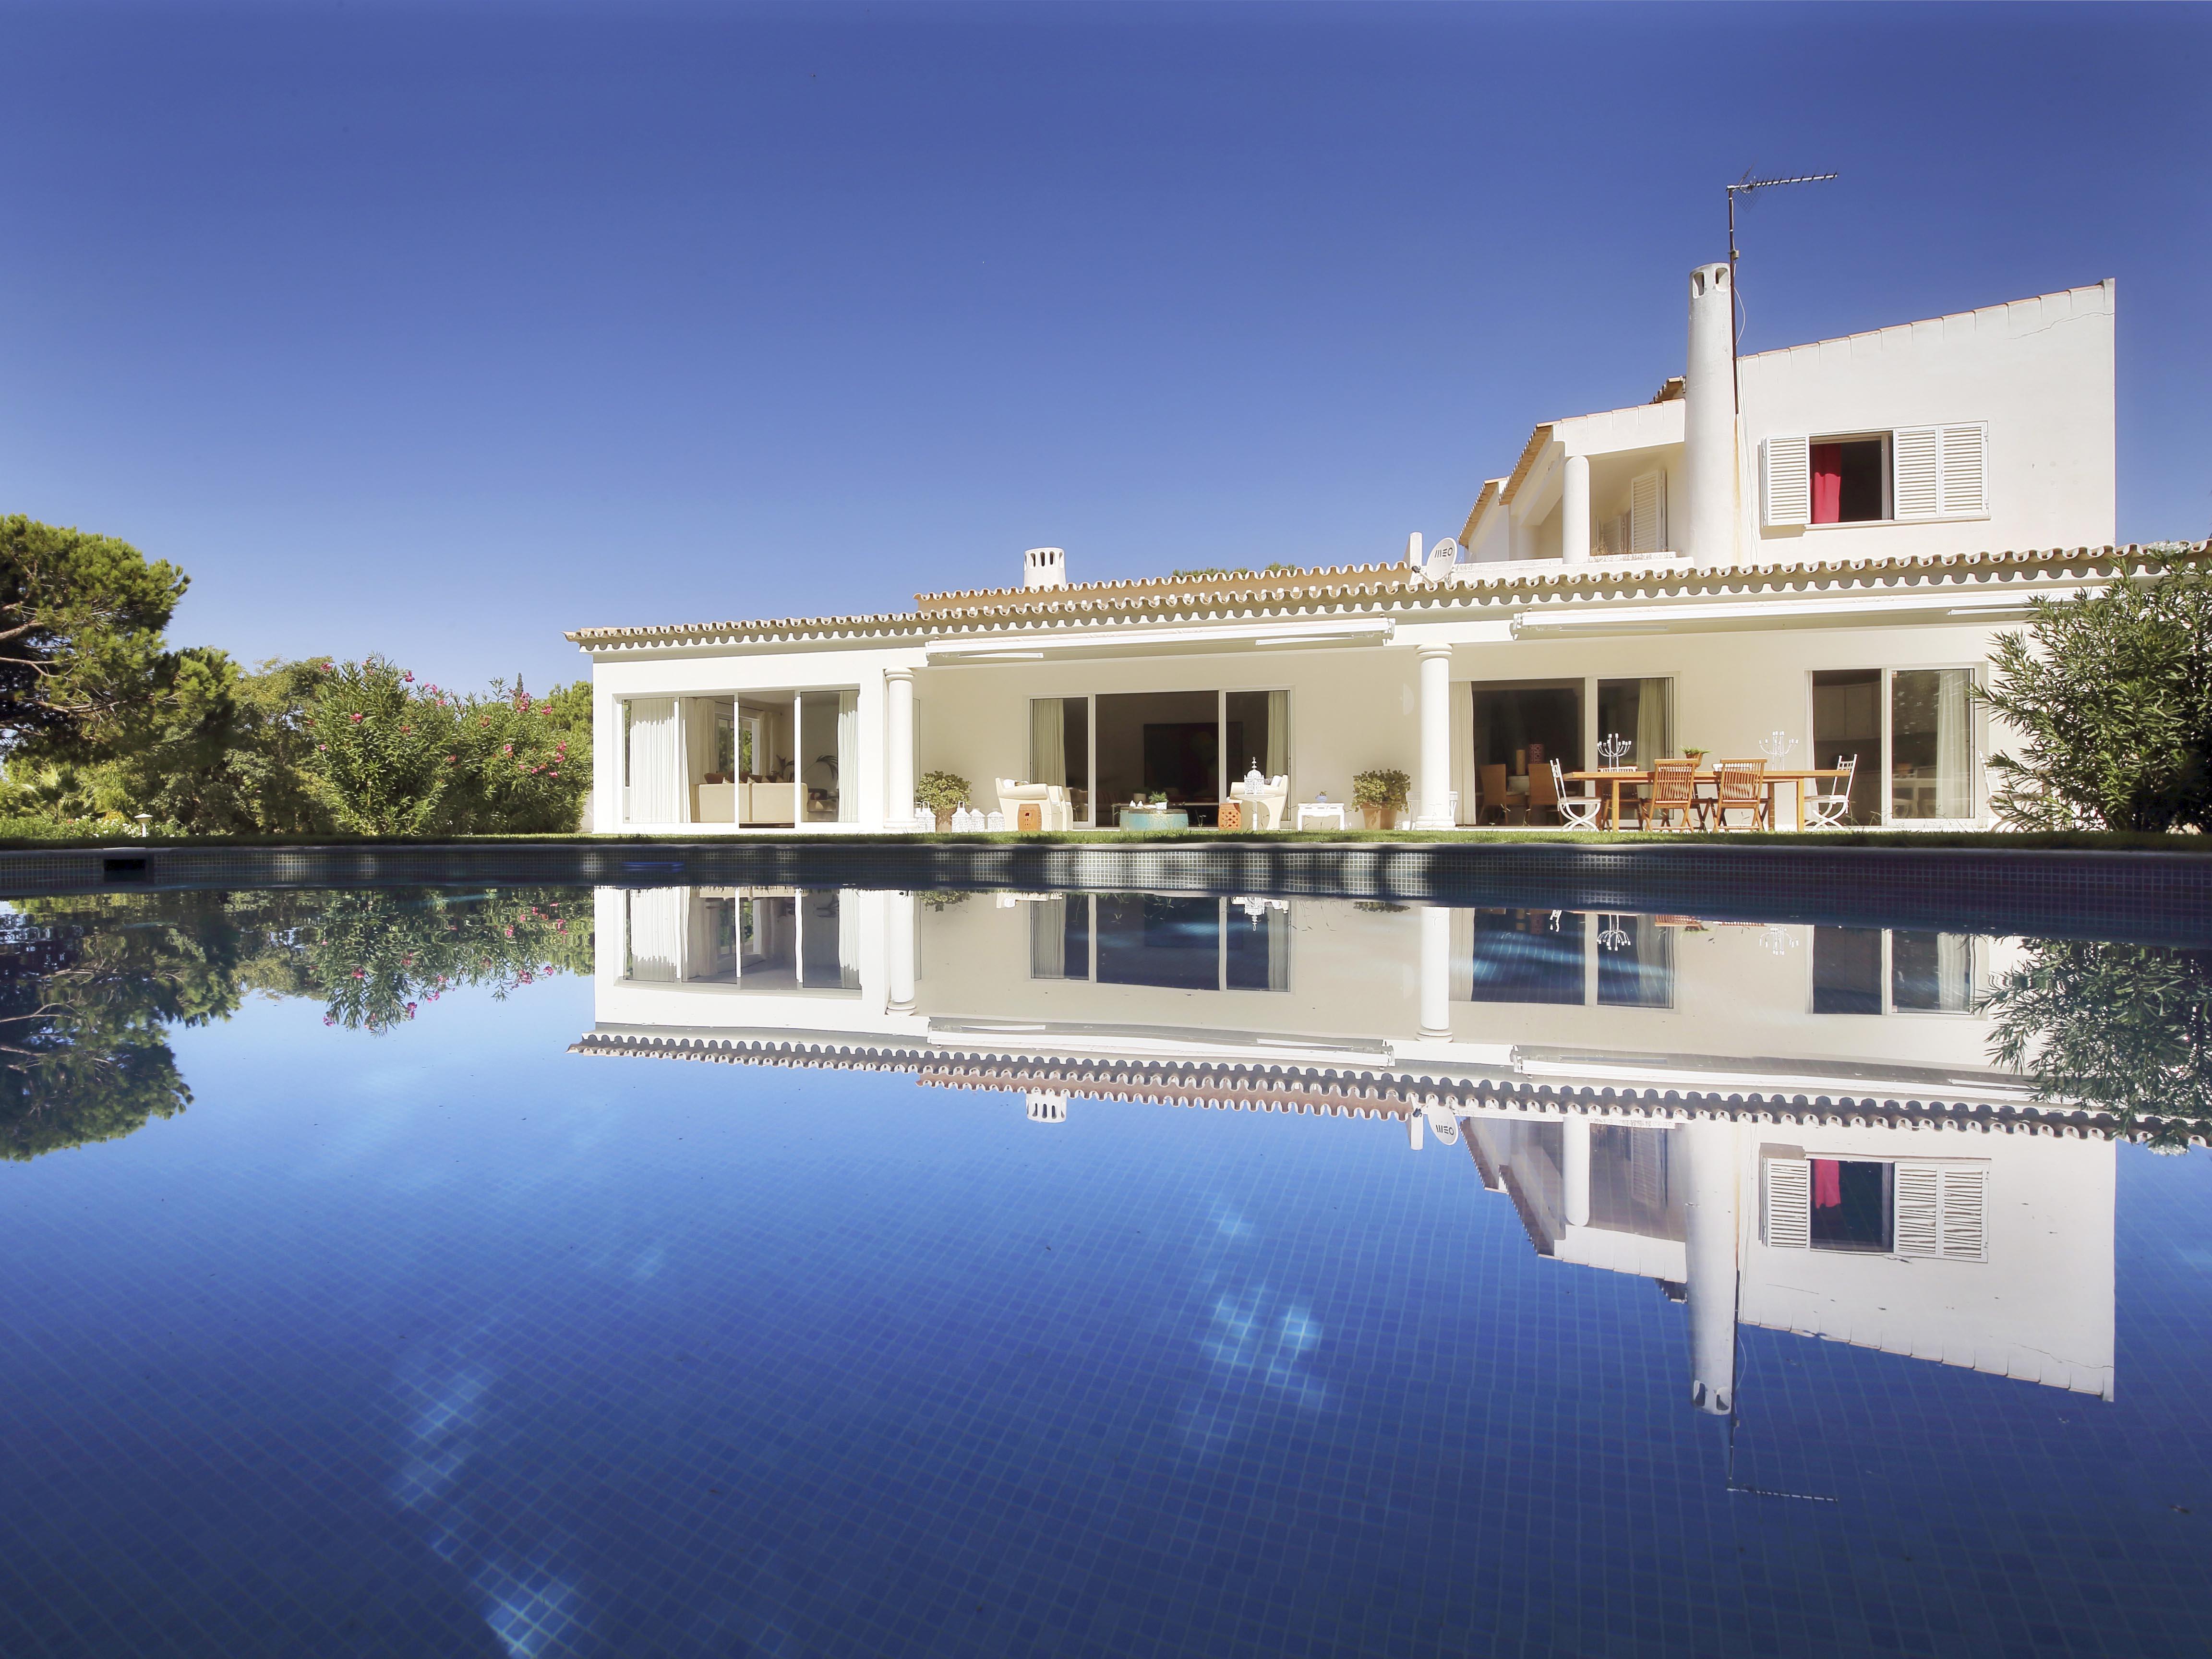 Moradia para Venda às Detached house, 6 bedrooms, for Sale Loule, Algarve, Portugal